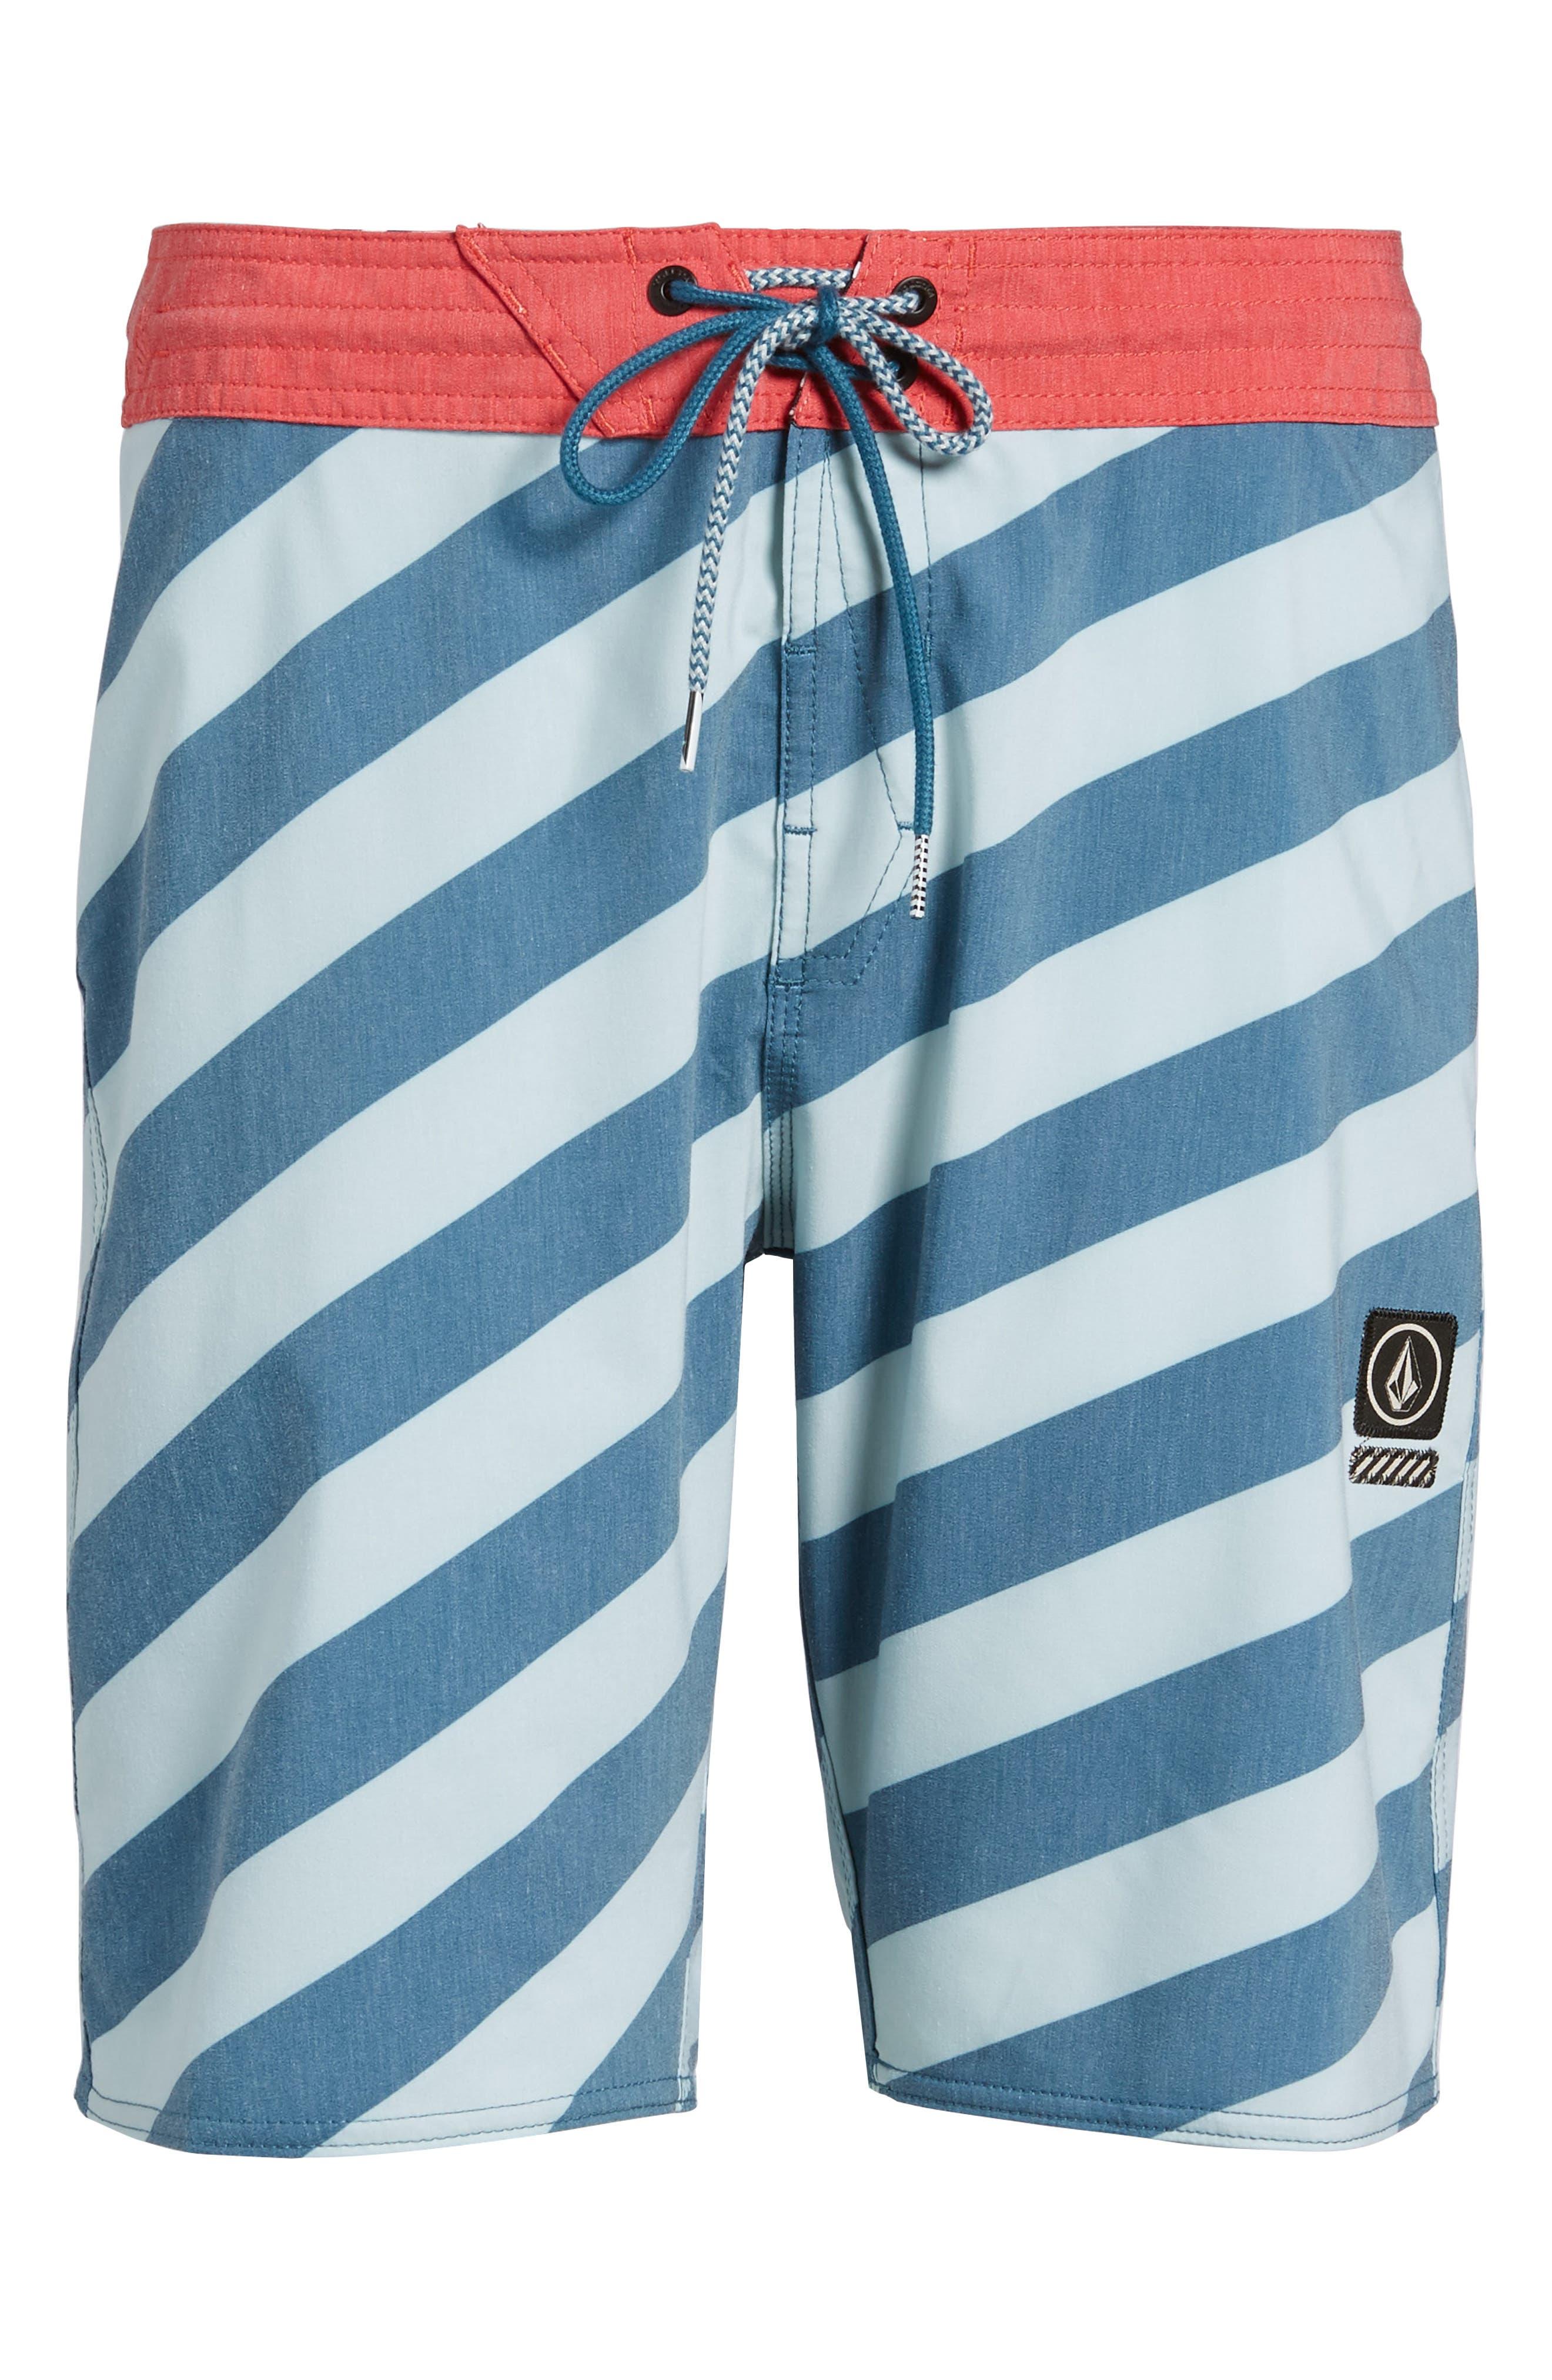 Stripey Slinger Board Shorts,                             Alternate thumbnail 6, color,                             Flight Blue